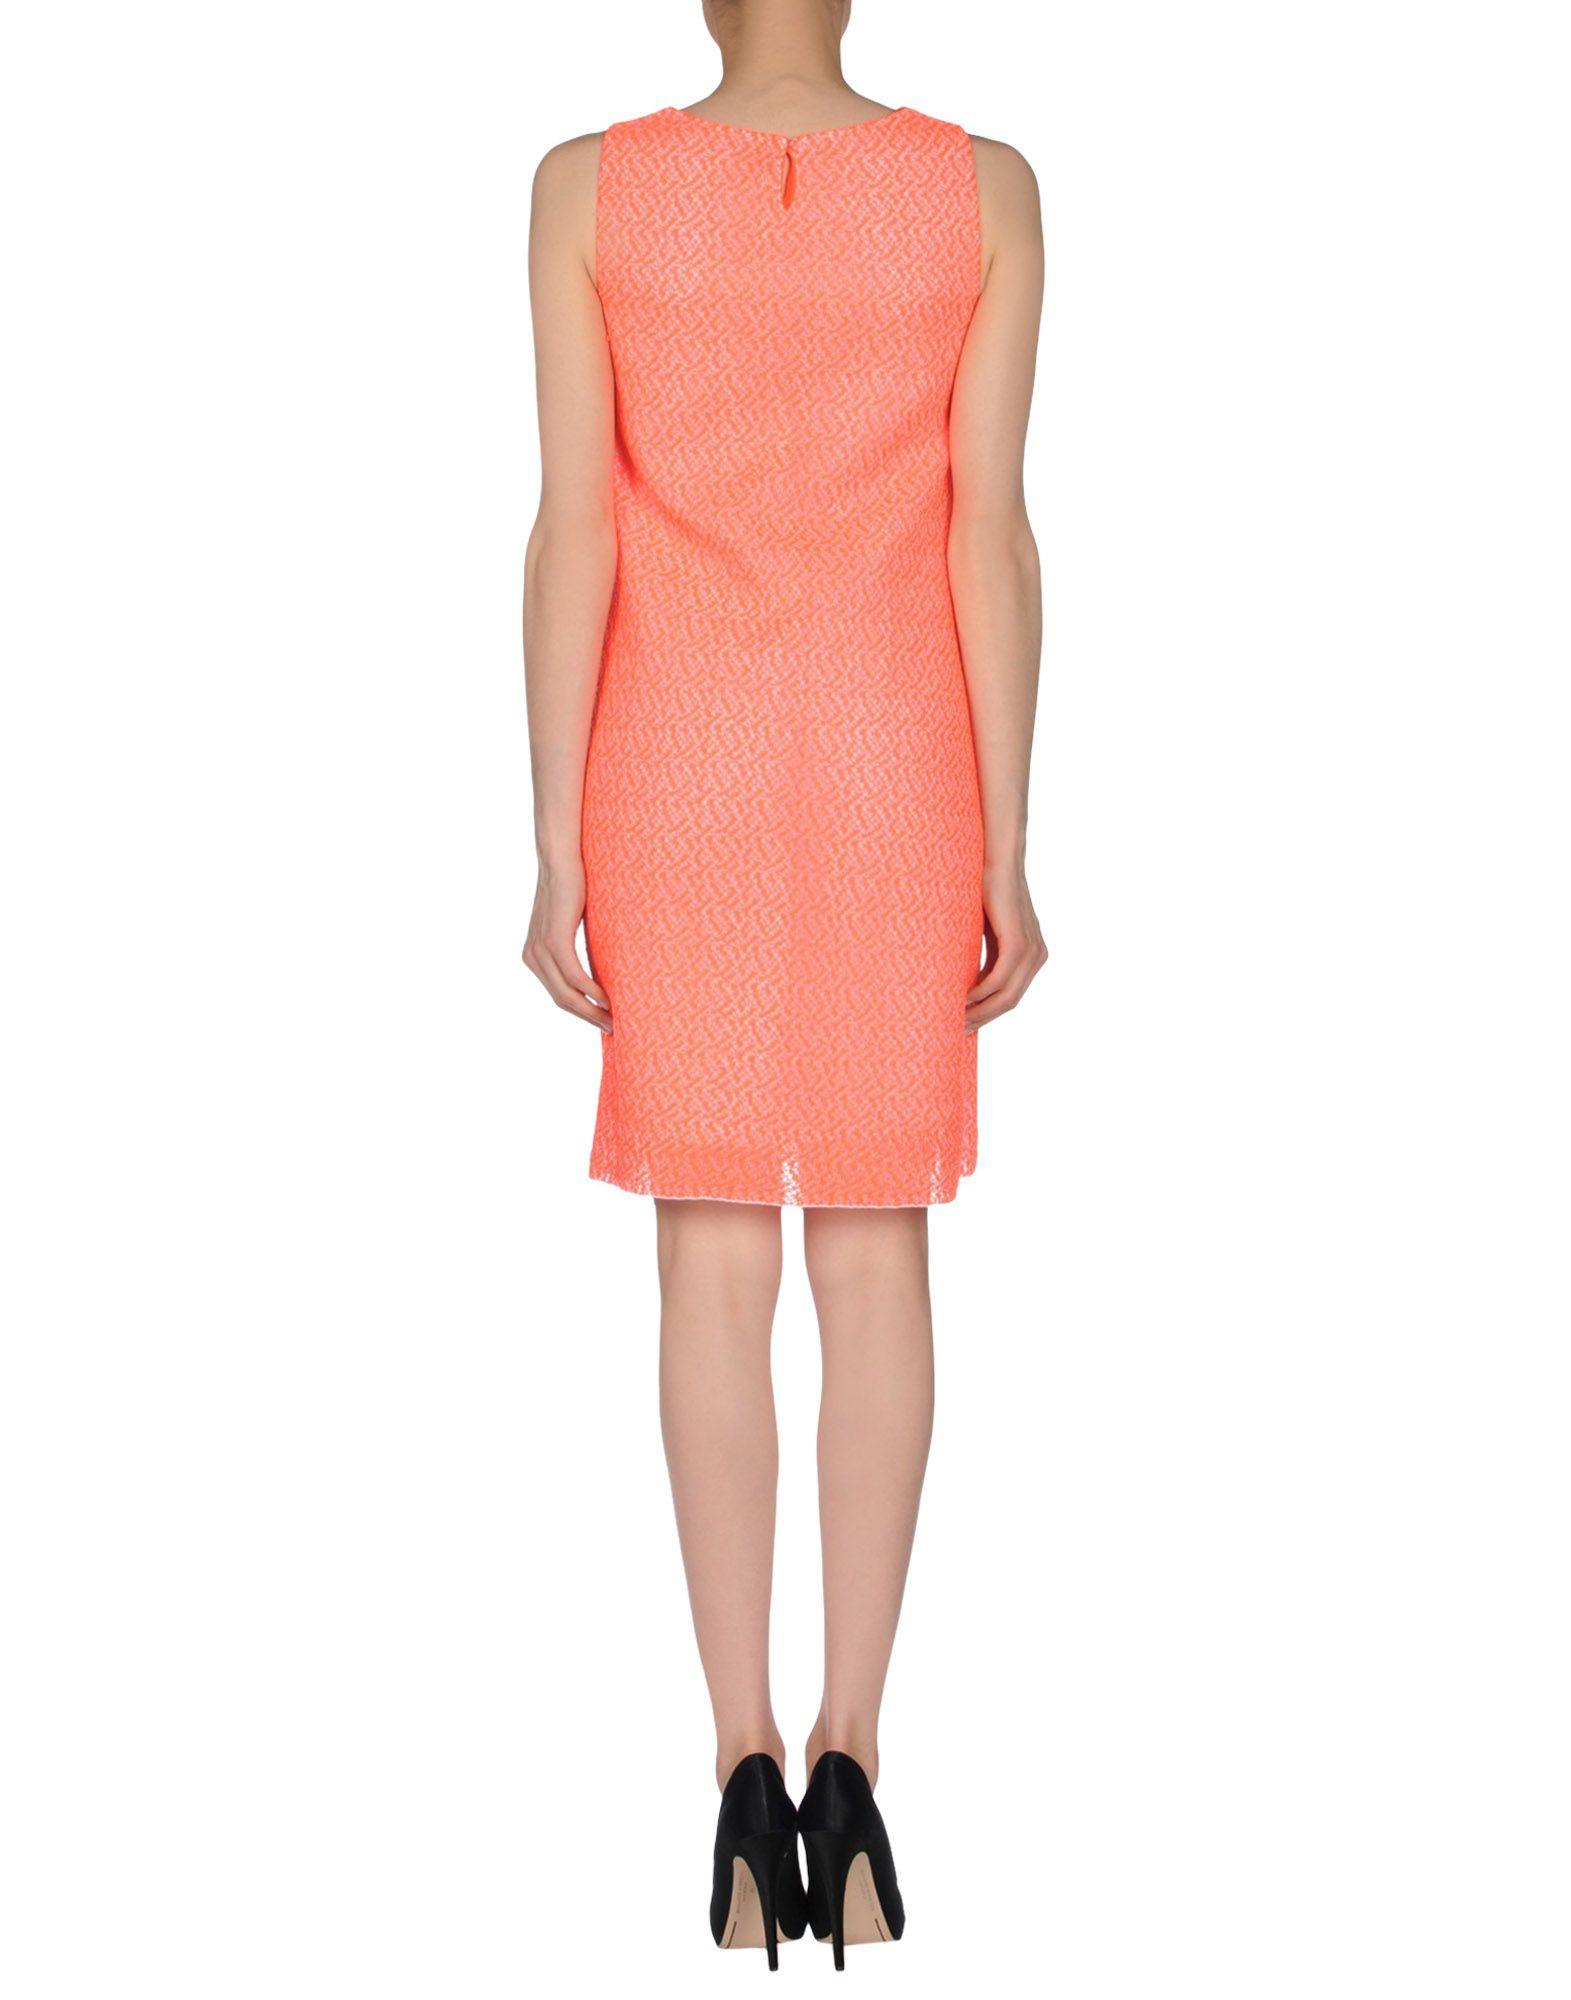 dior short dresses - photo #31